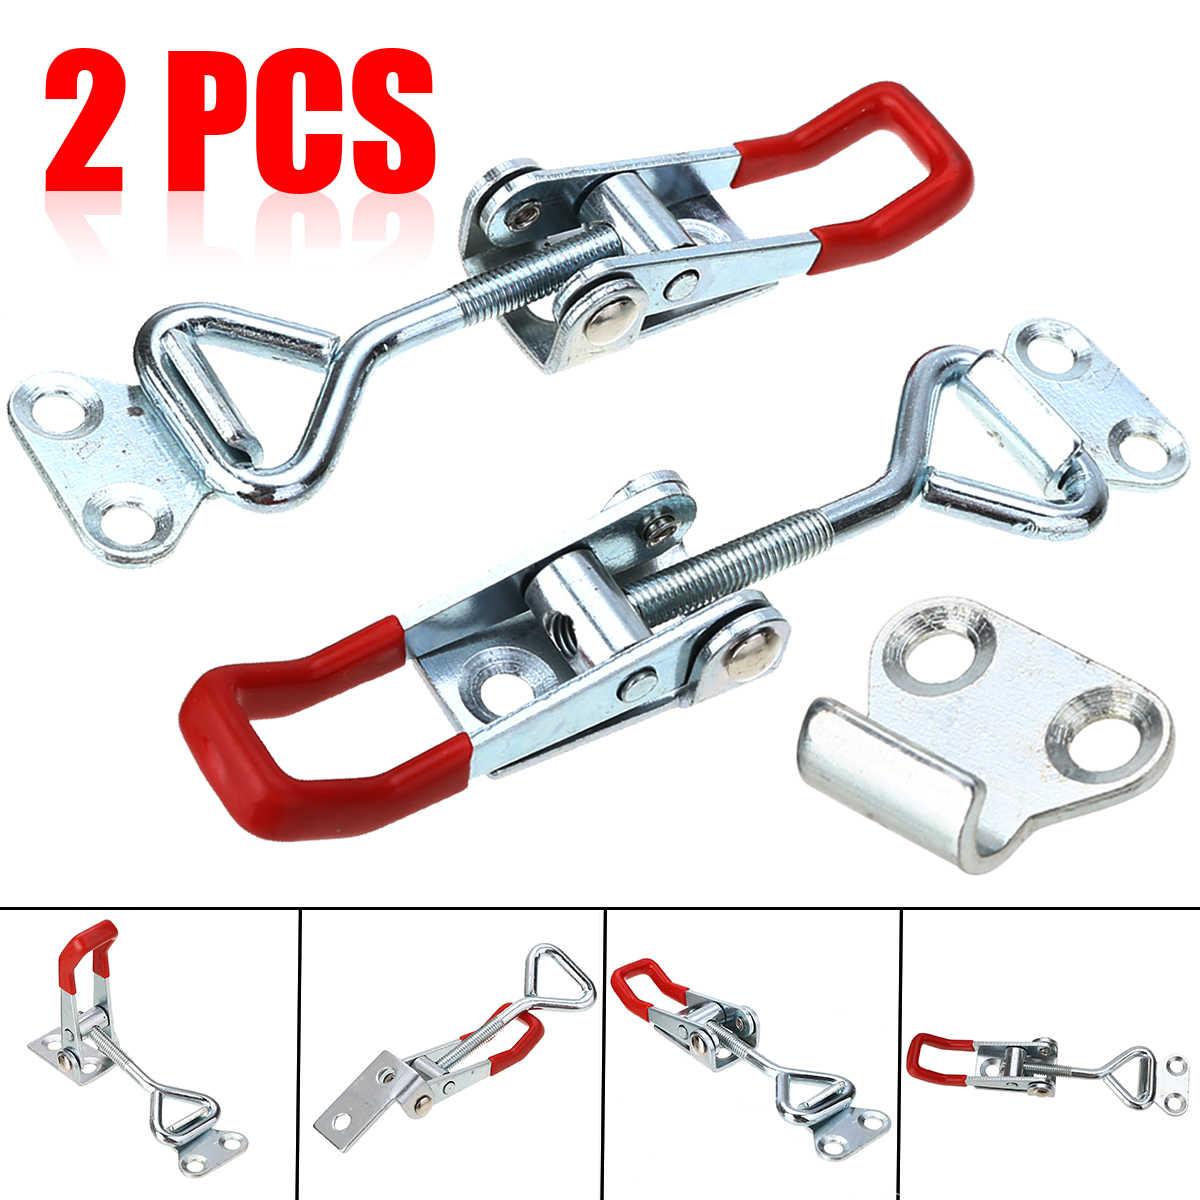 1//4 pcs Locking Toggle Catch /& Plates Heavy Duty Case Clamp Latch Box Clips K5N4